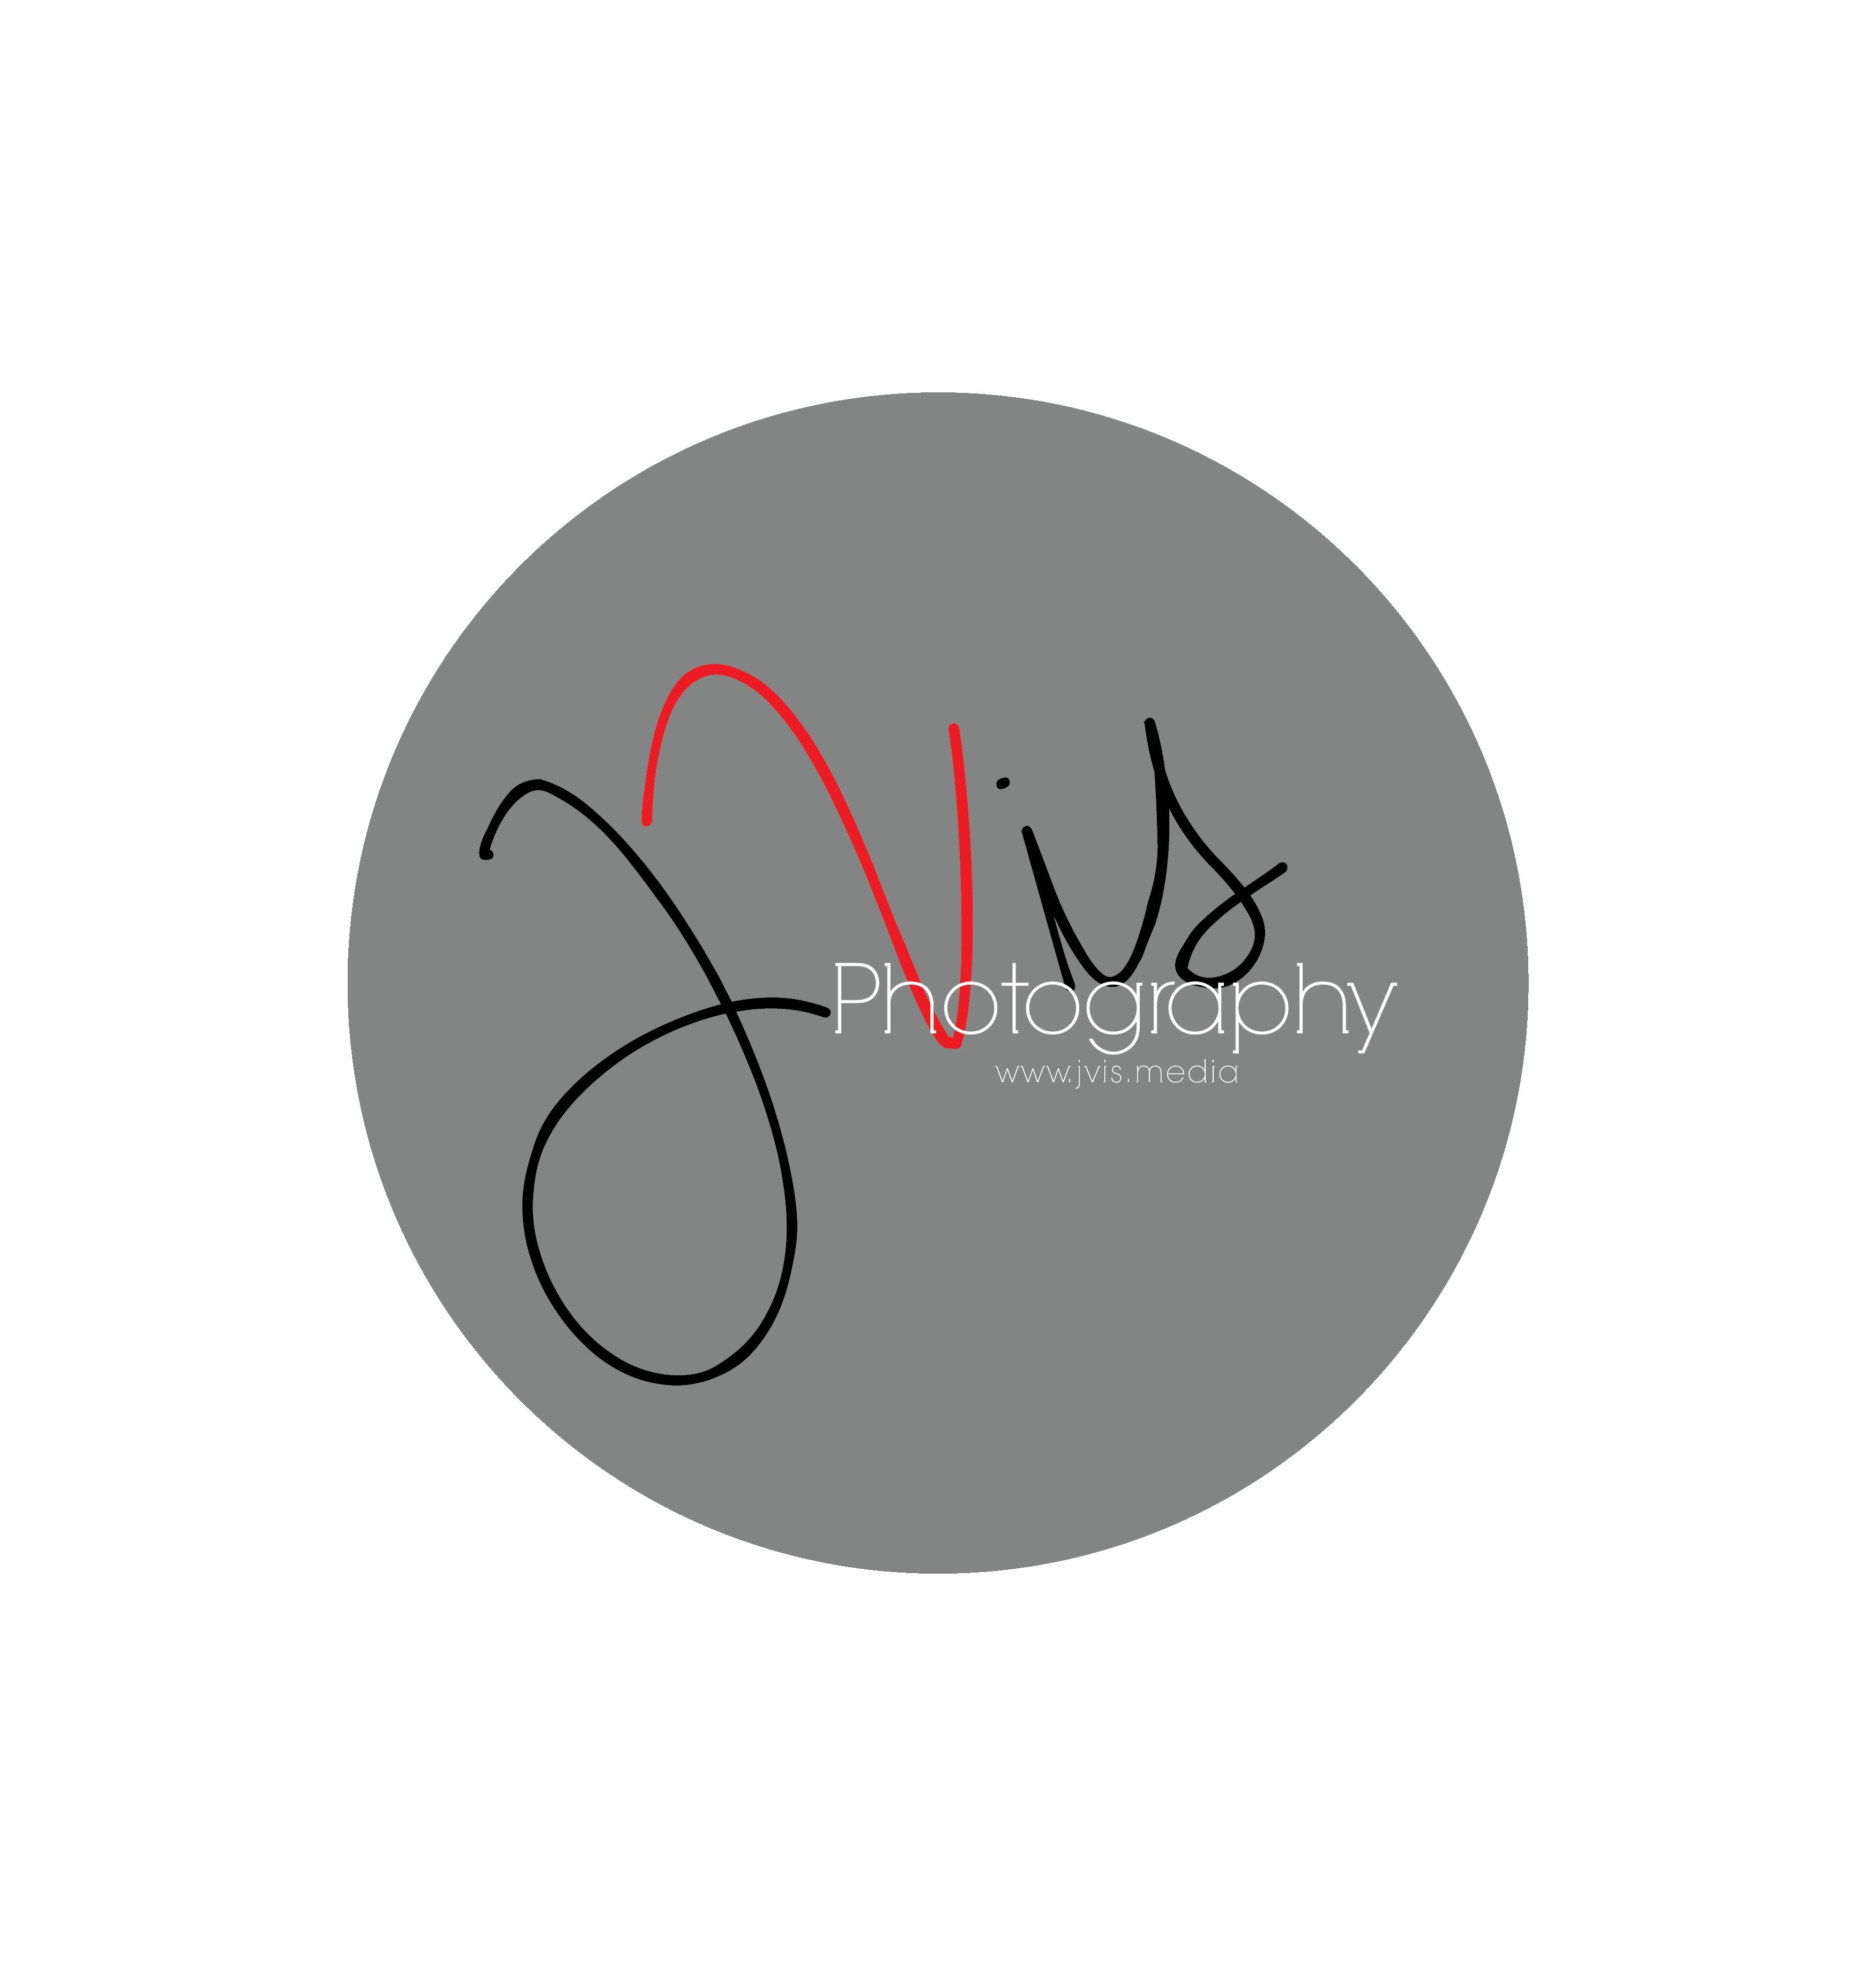 JVS logo (2016)